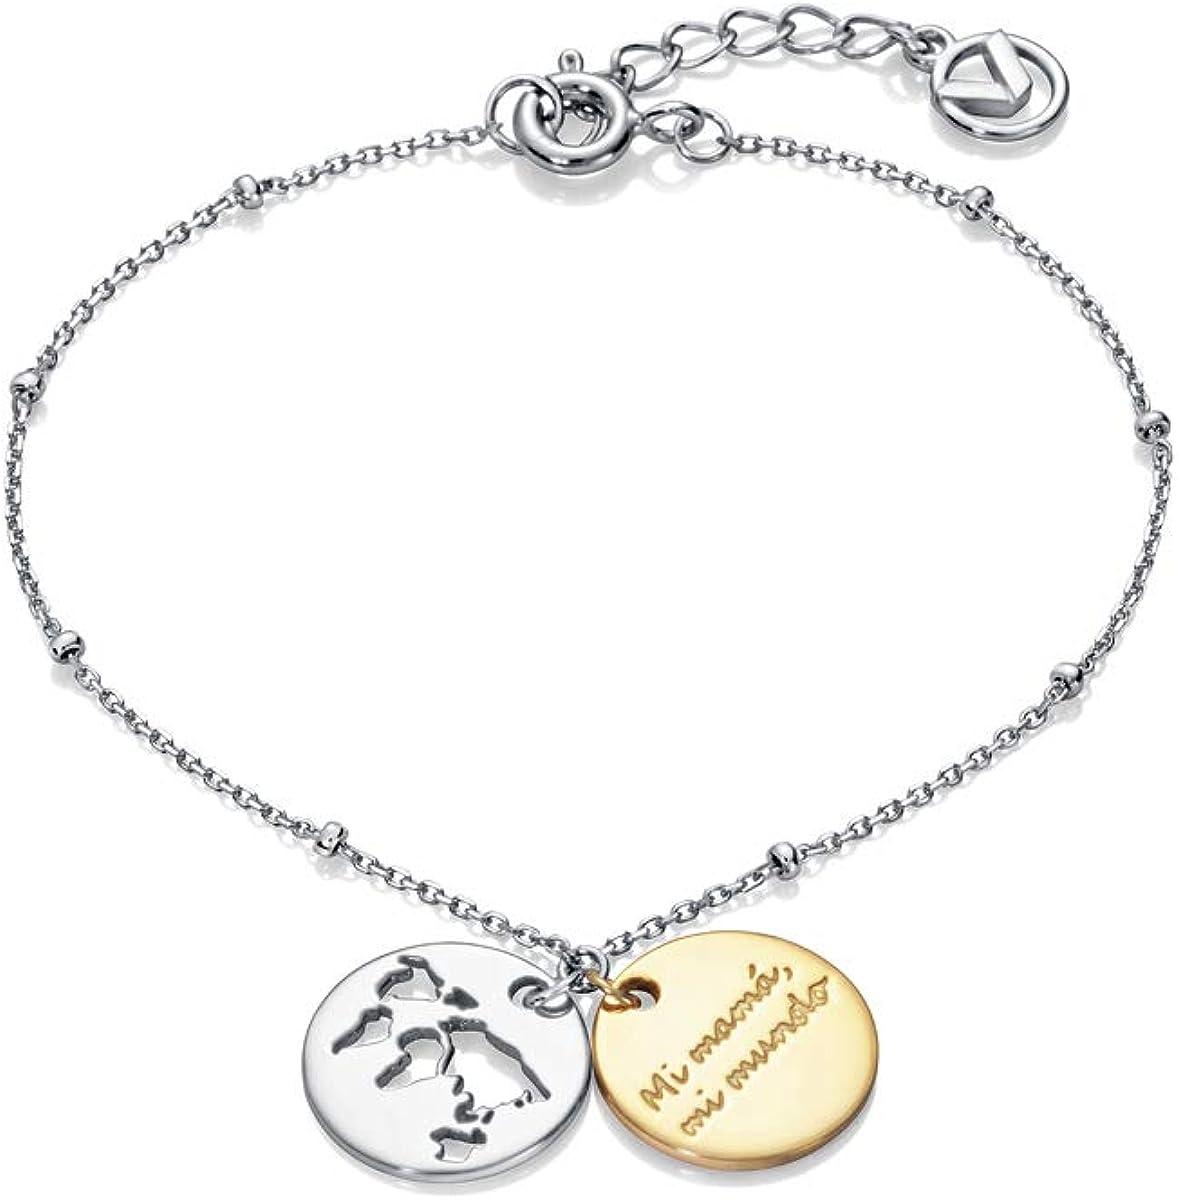 Viceroy Pulsera Jewels 85003P100-09 Día de la Madre